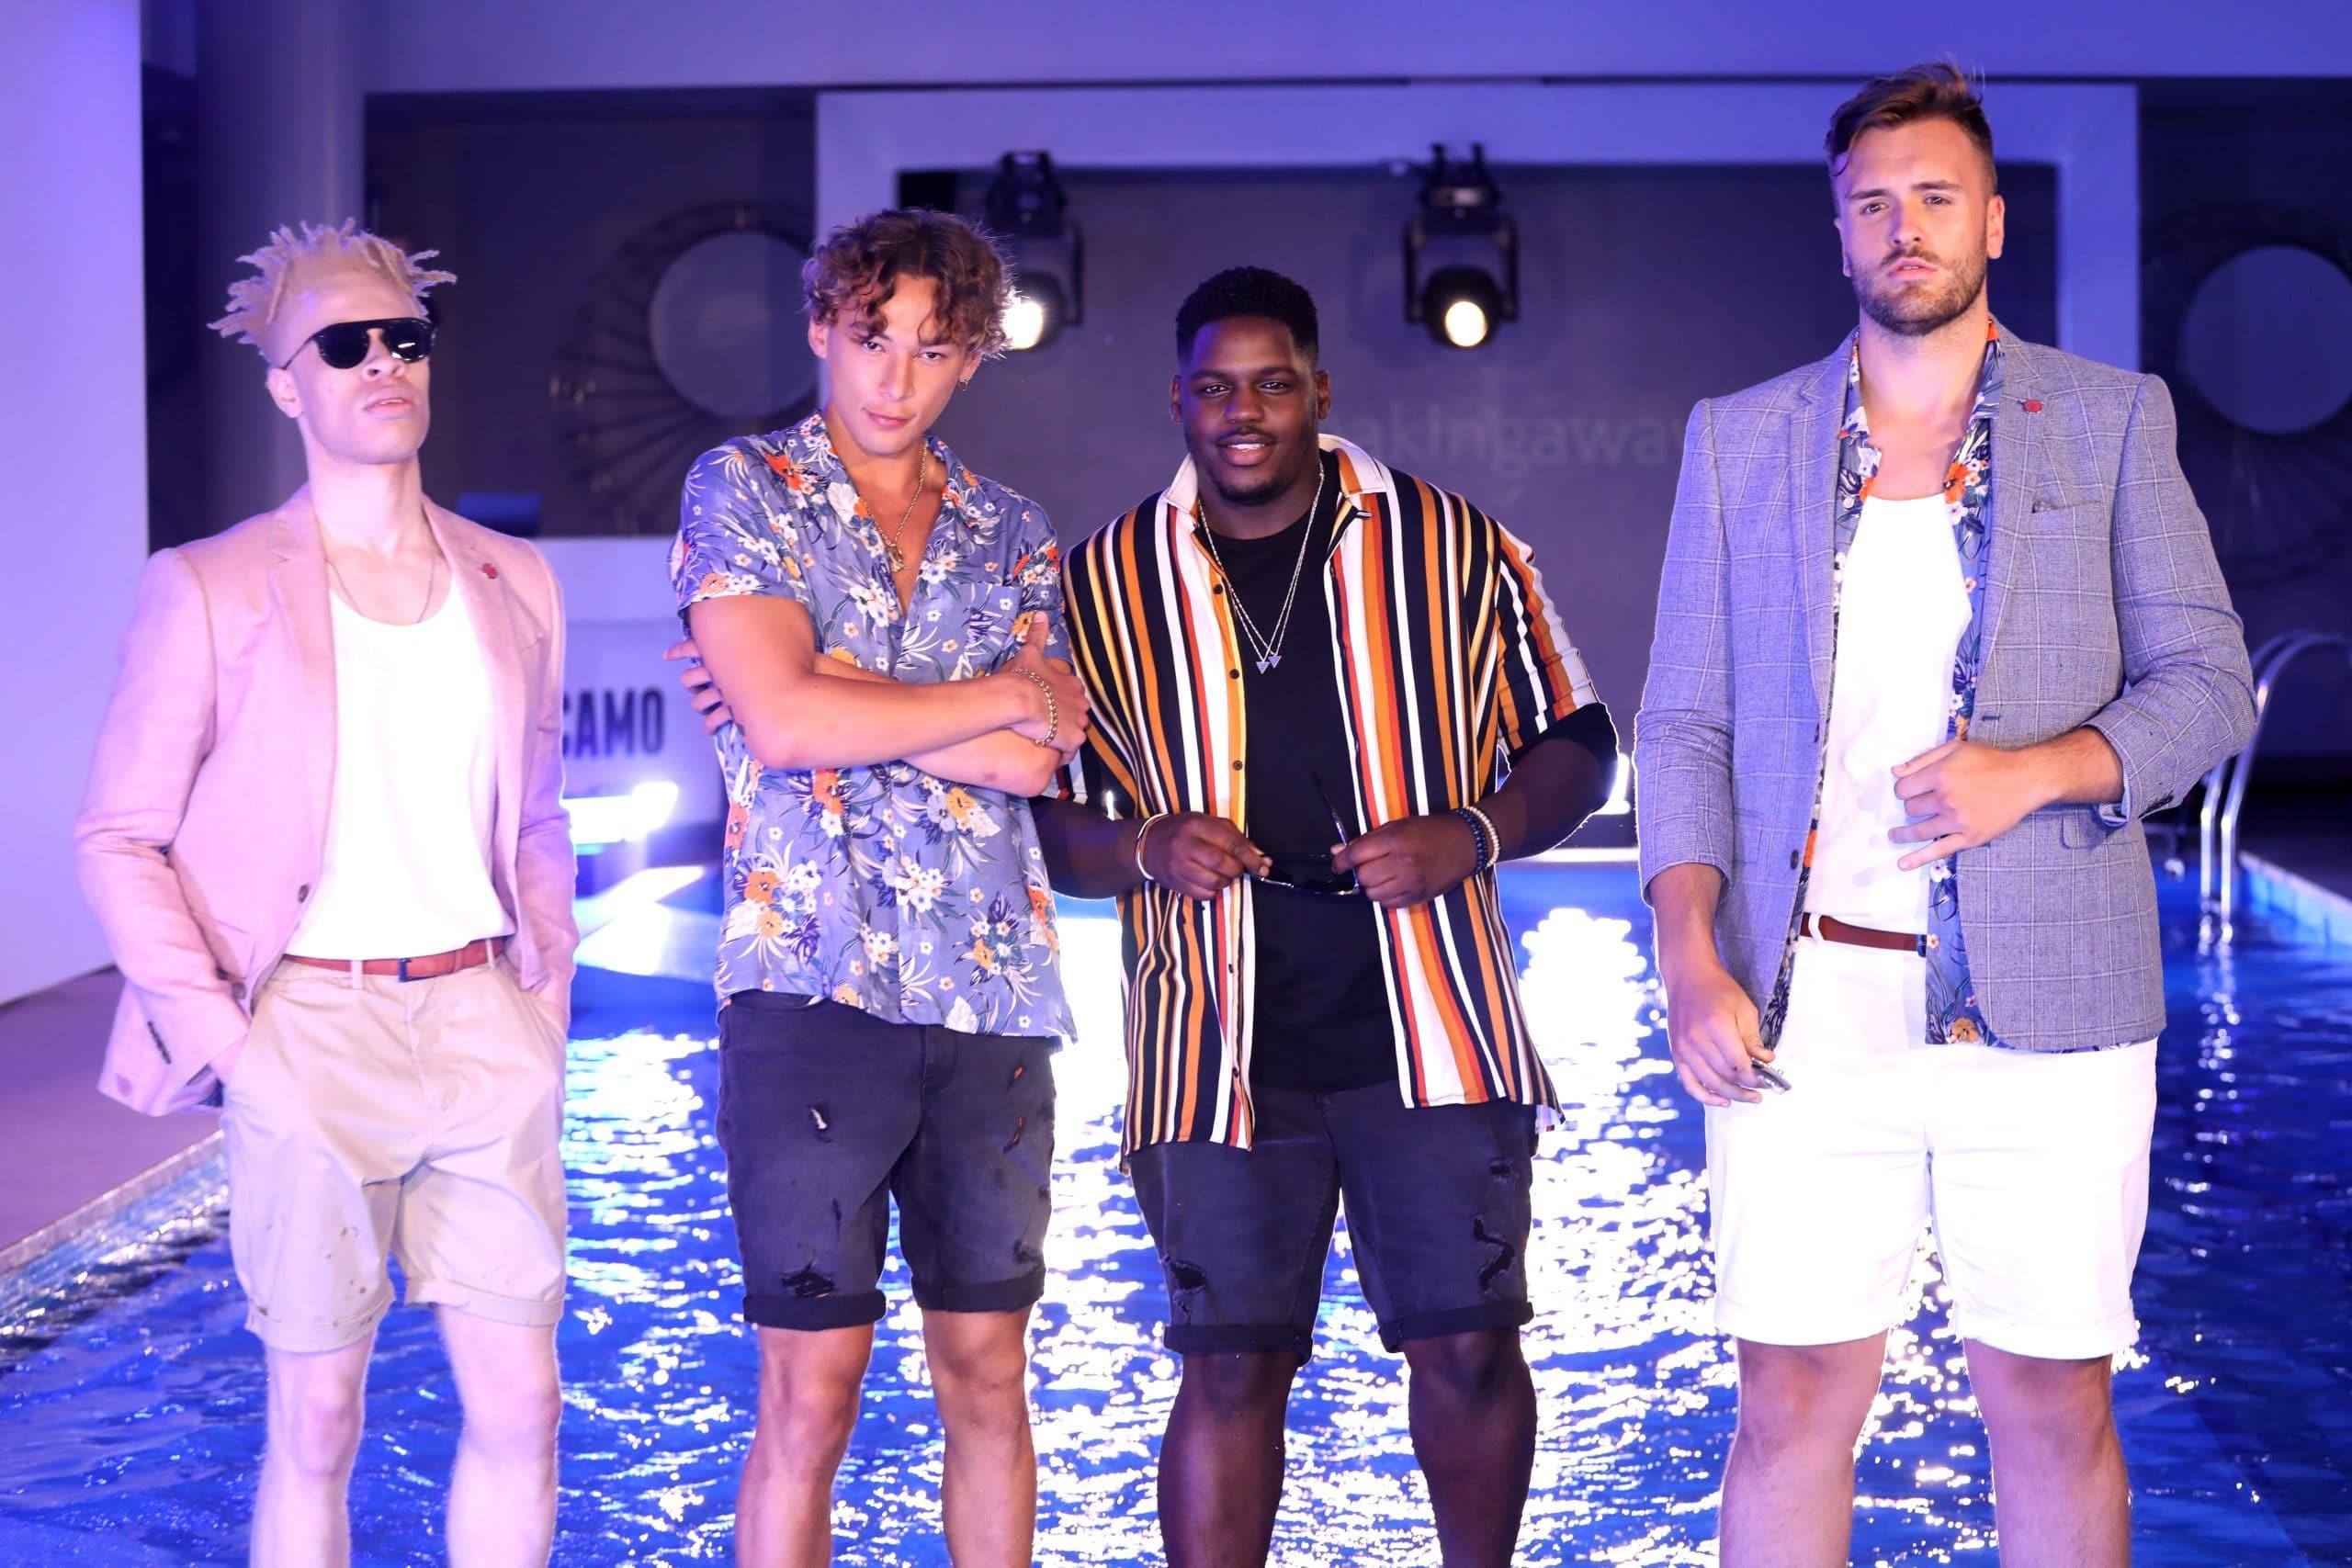 diverse fashion show